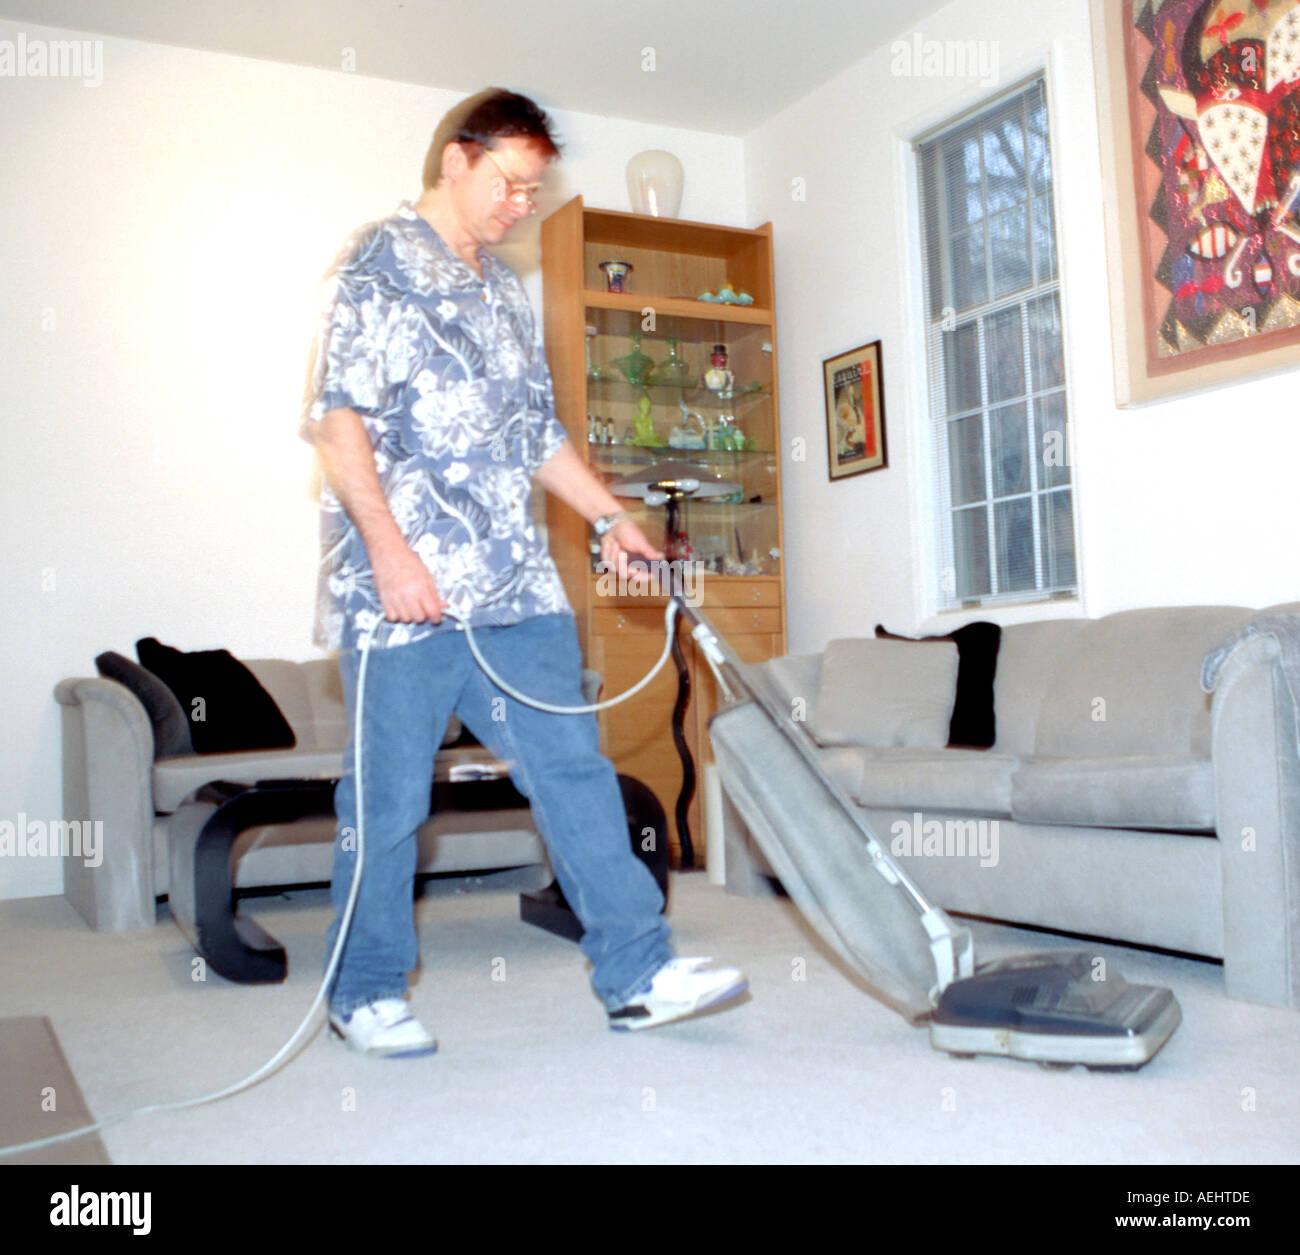 amusing nice living room stock photography image 18909472   Man vacuuming living room Stock Photo: 4469981 - Alamy